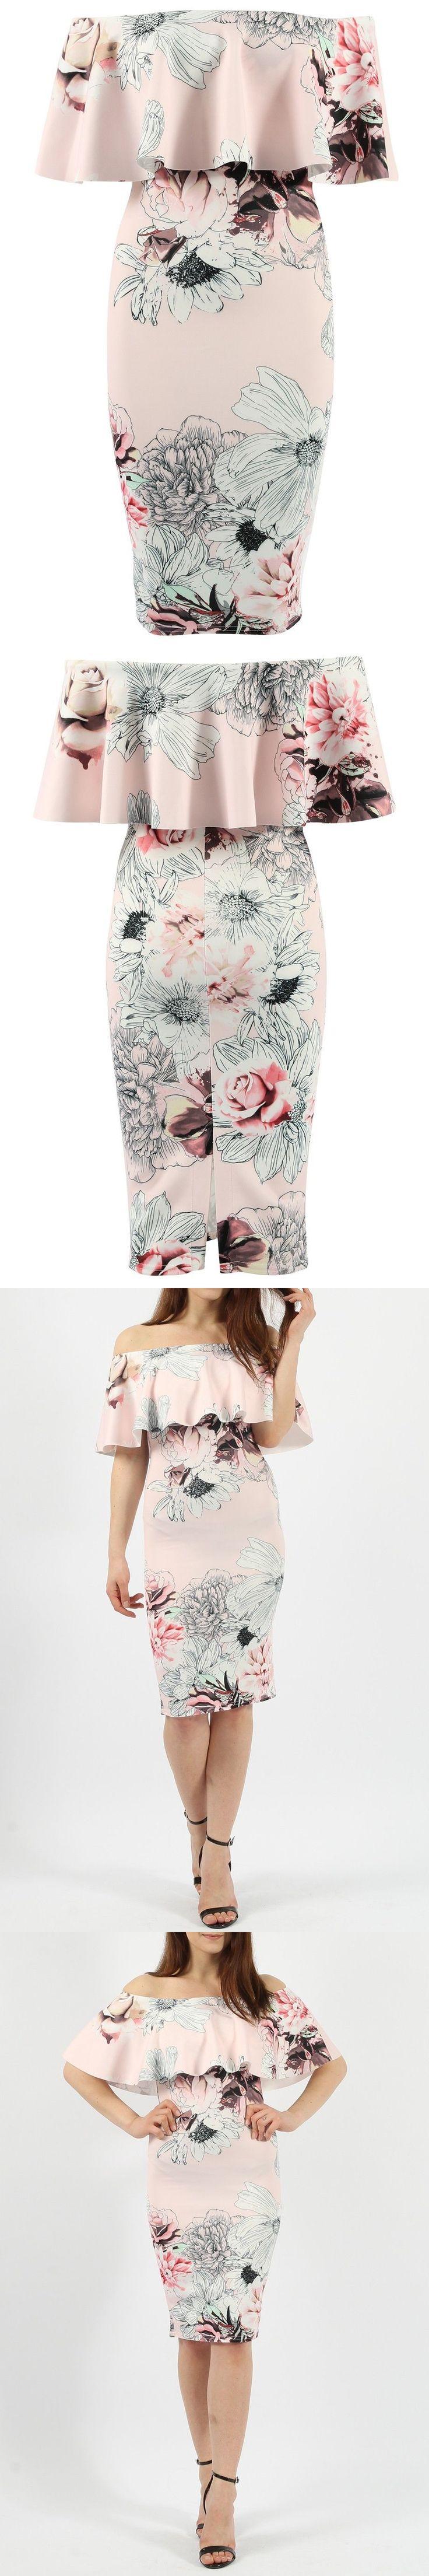 Women Fashion: Women Summer Sleeve Short Cocktail Evening Party Long Midi Dress Fashion Mini -> BUY IT NOW ONLY: $49.0 on eBay!